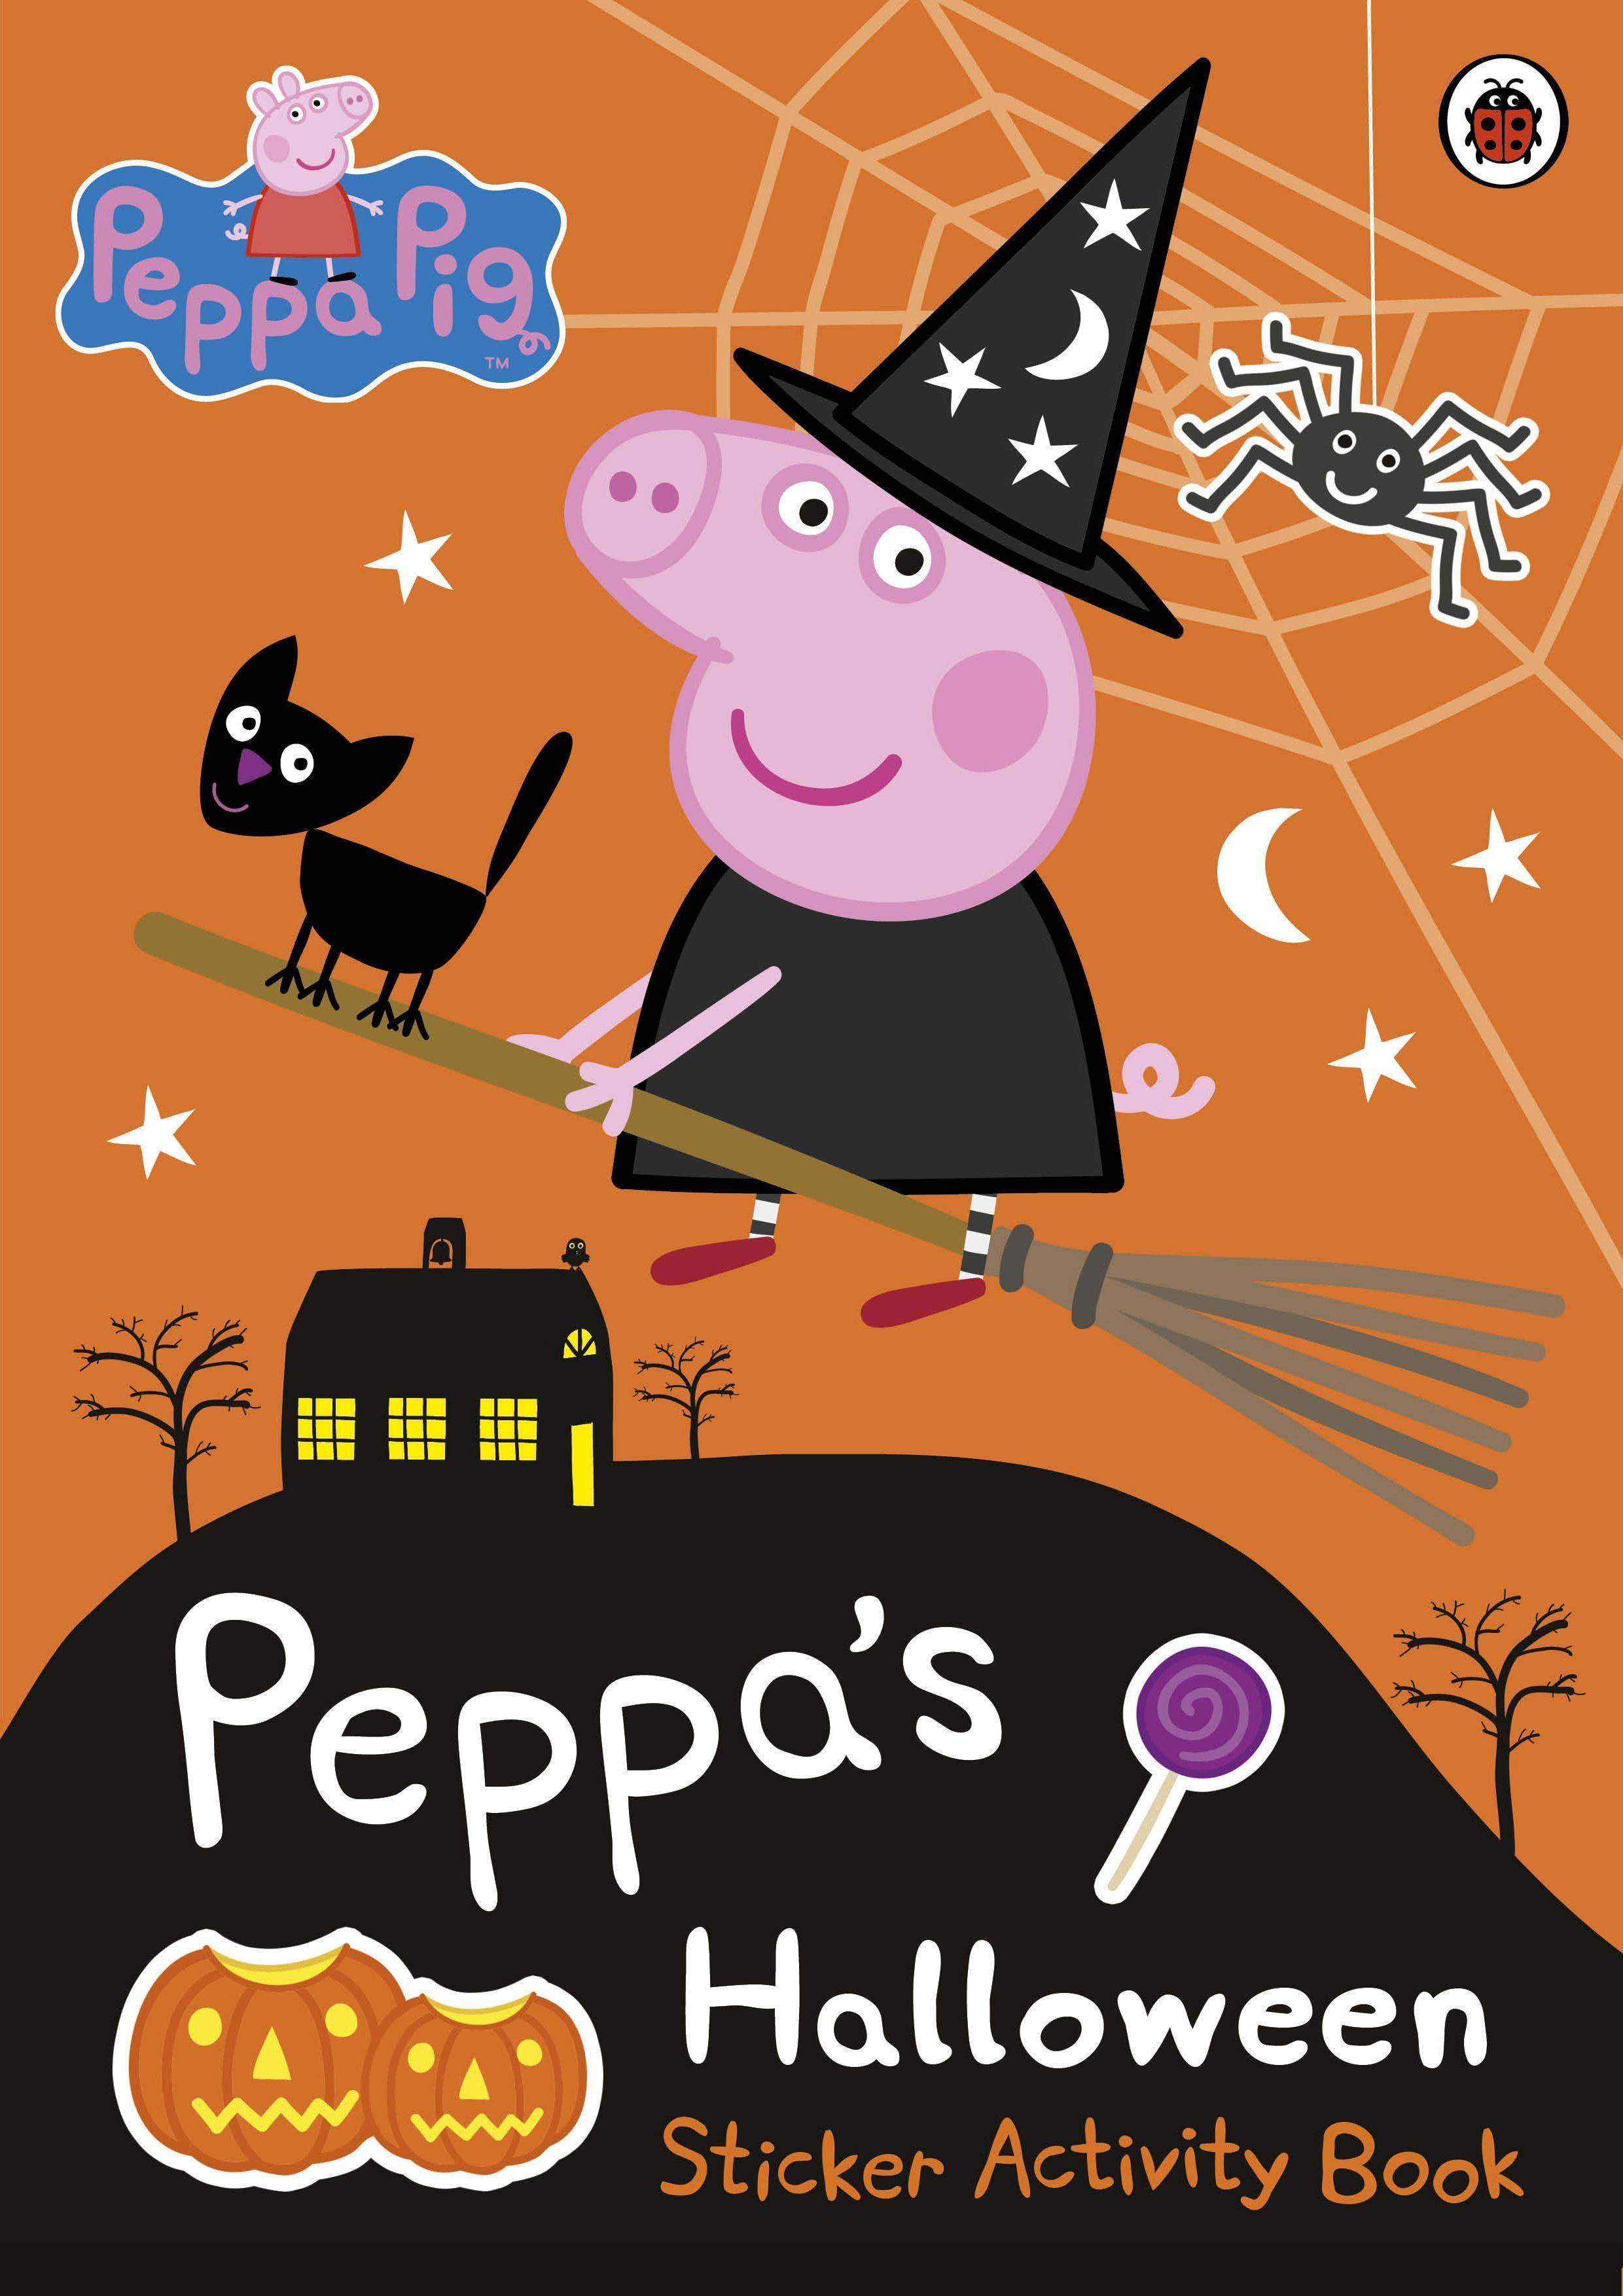 PEPPA PIG: PEPPA S HALLOWEEN | VV.AA. | Comprar libro 9780723296225